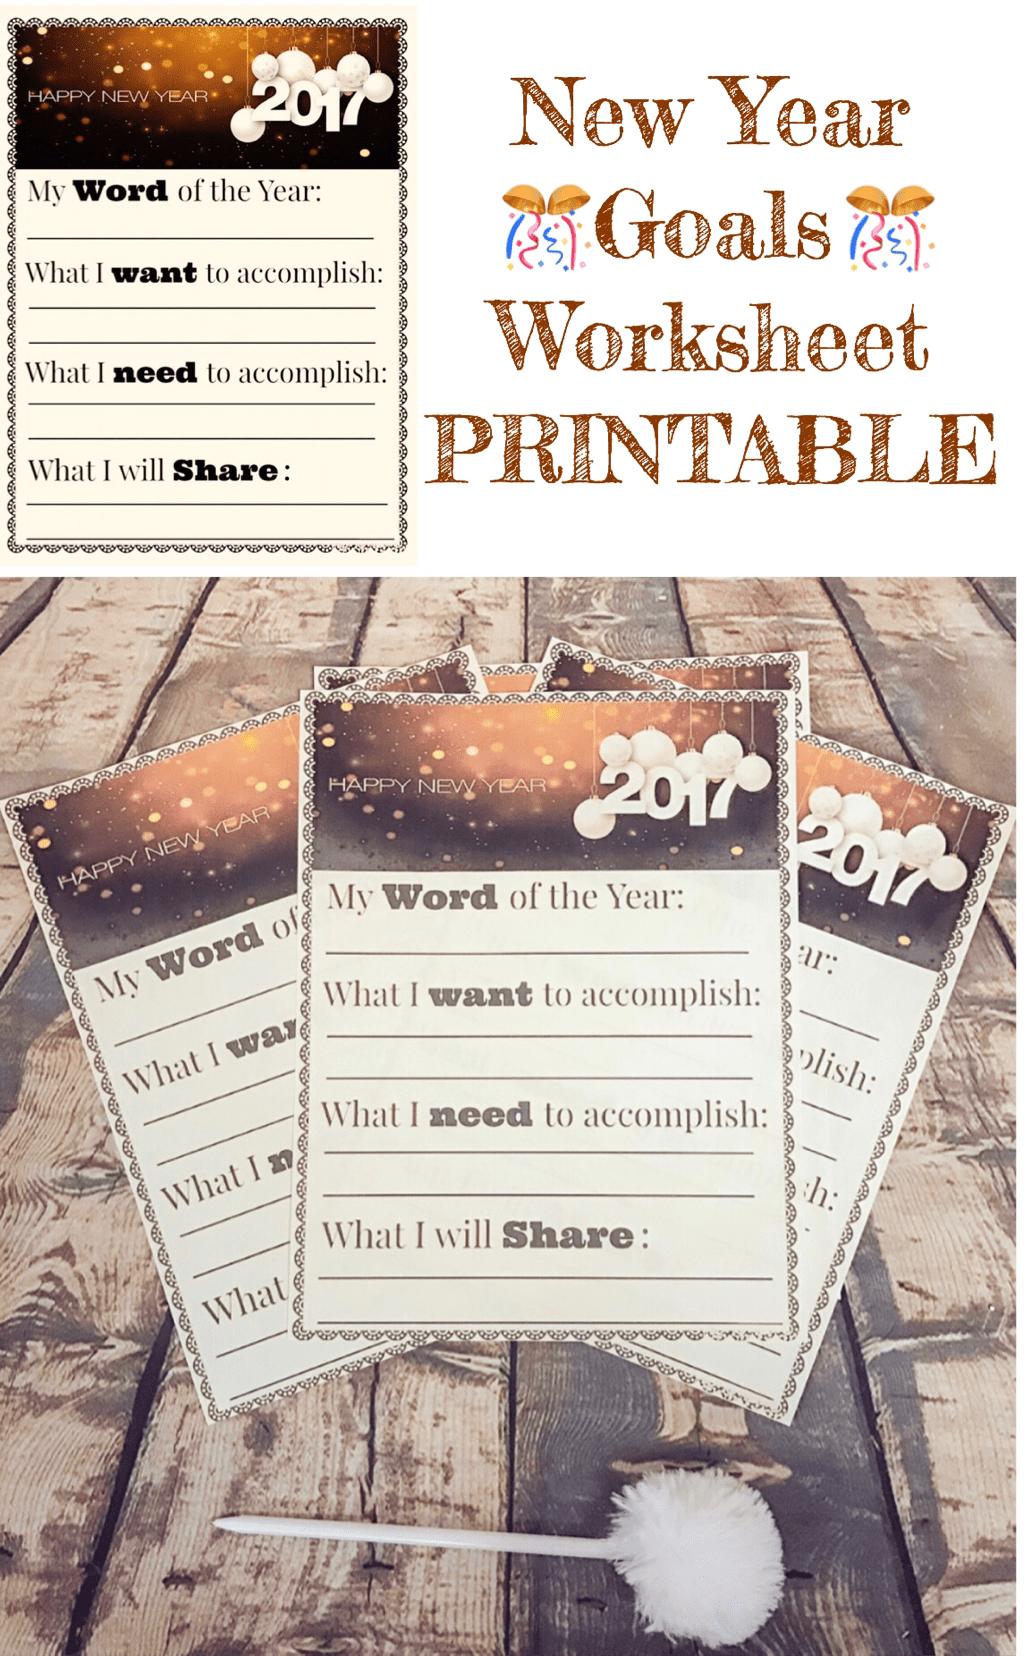 New Year Goals Worksheet Free Printable